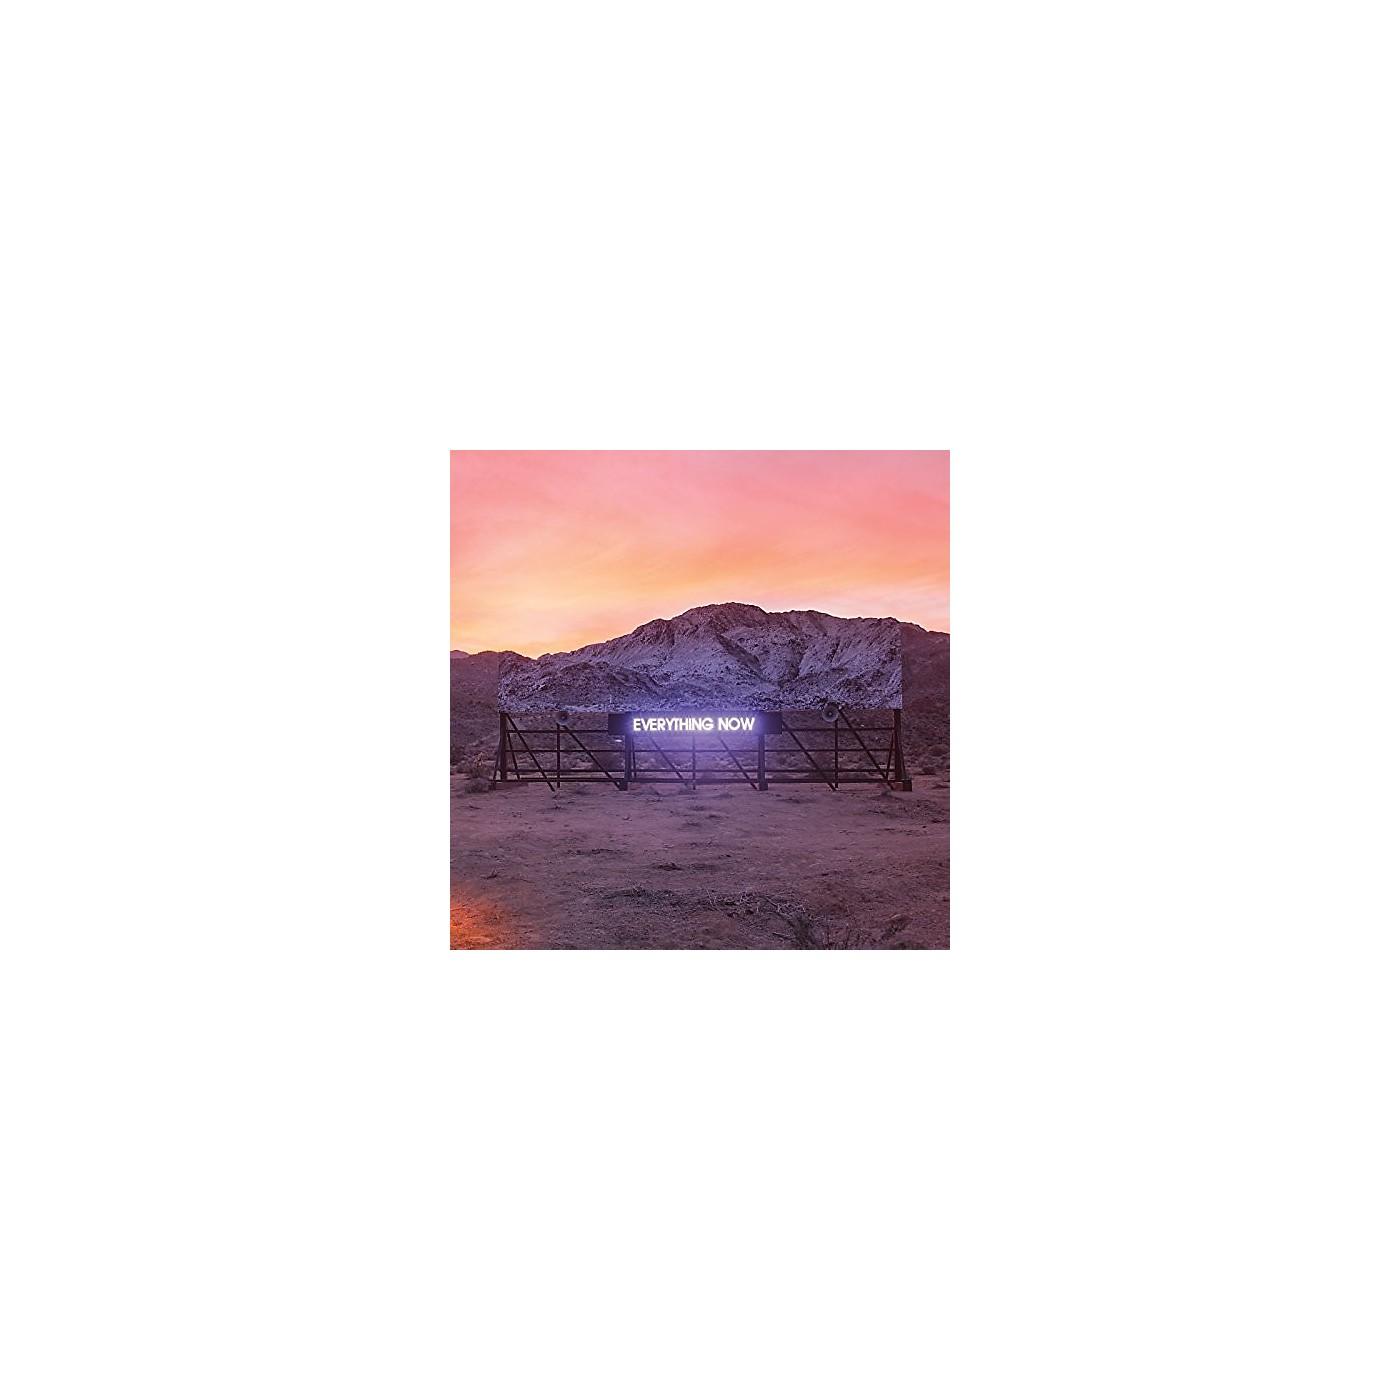 Alliance Arcade Fire - Everything Now Vinyl Single thumbnail